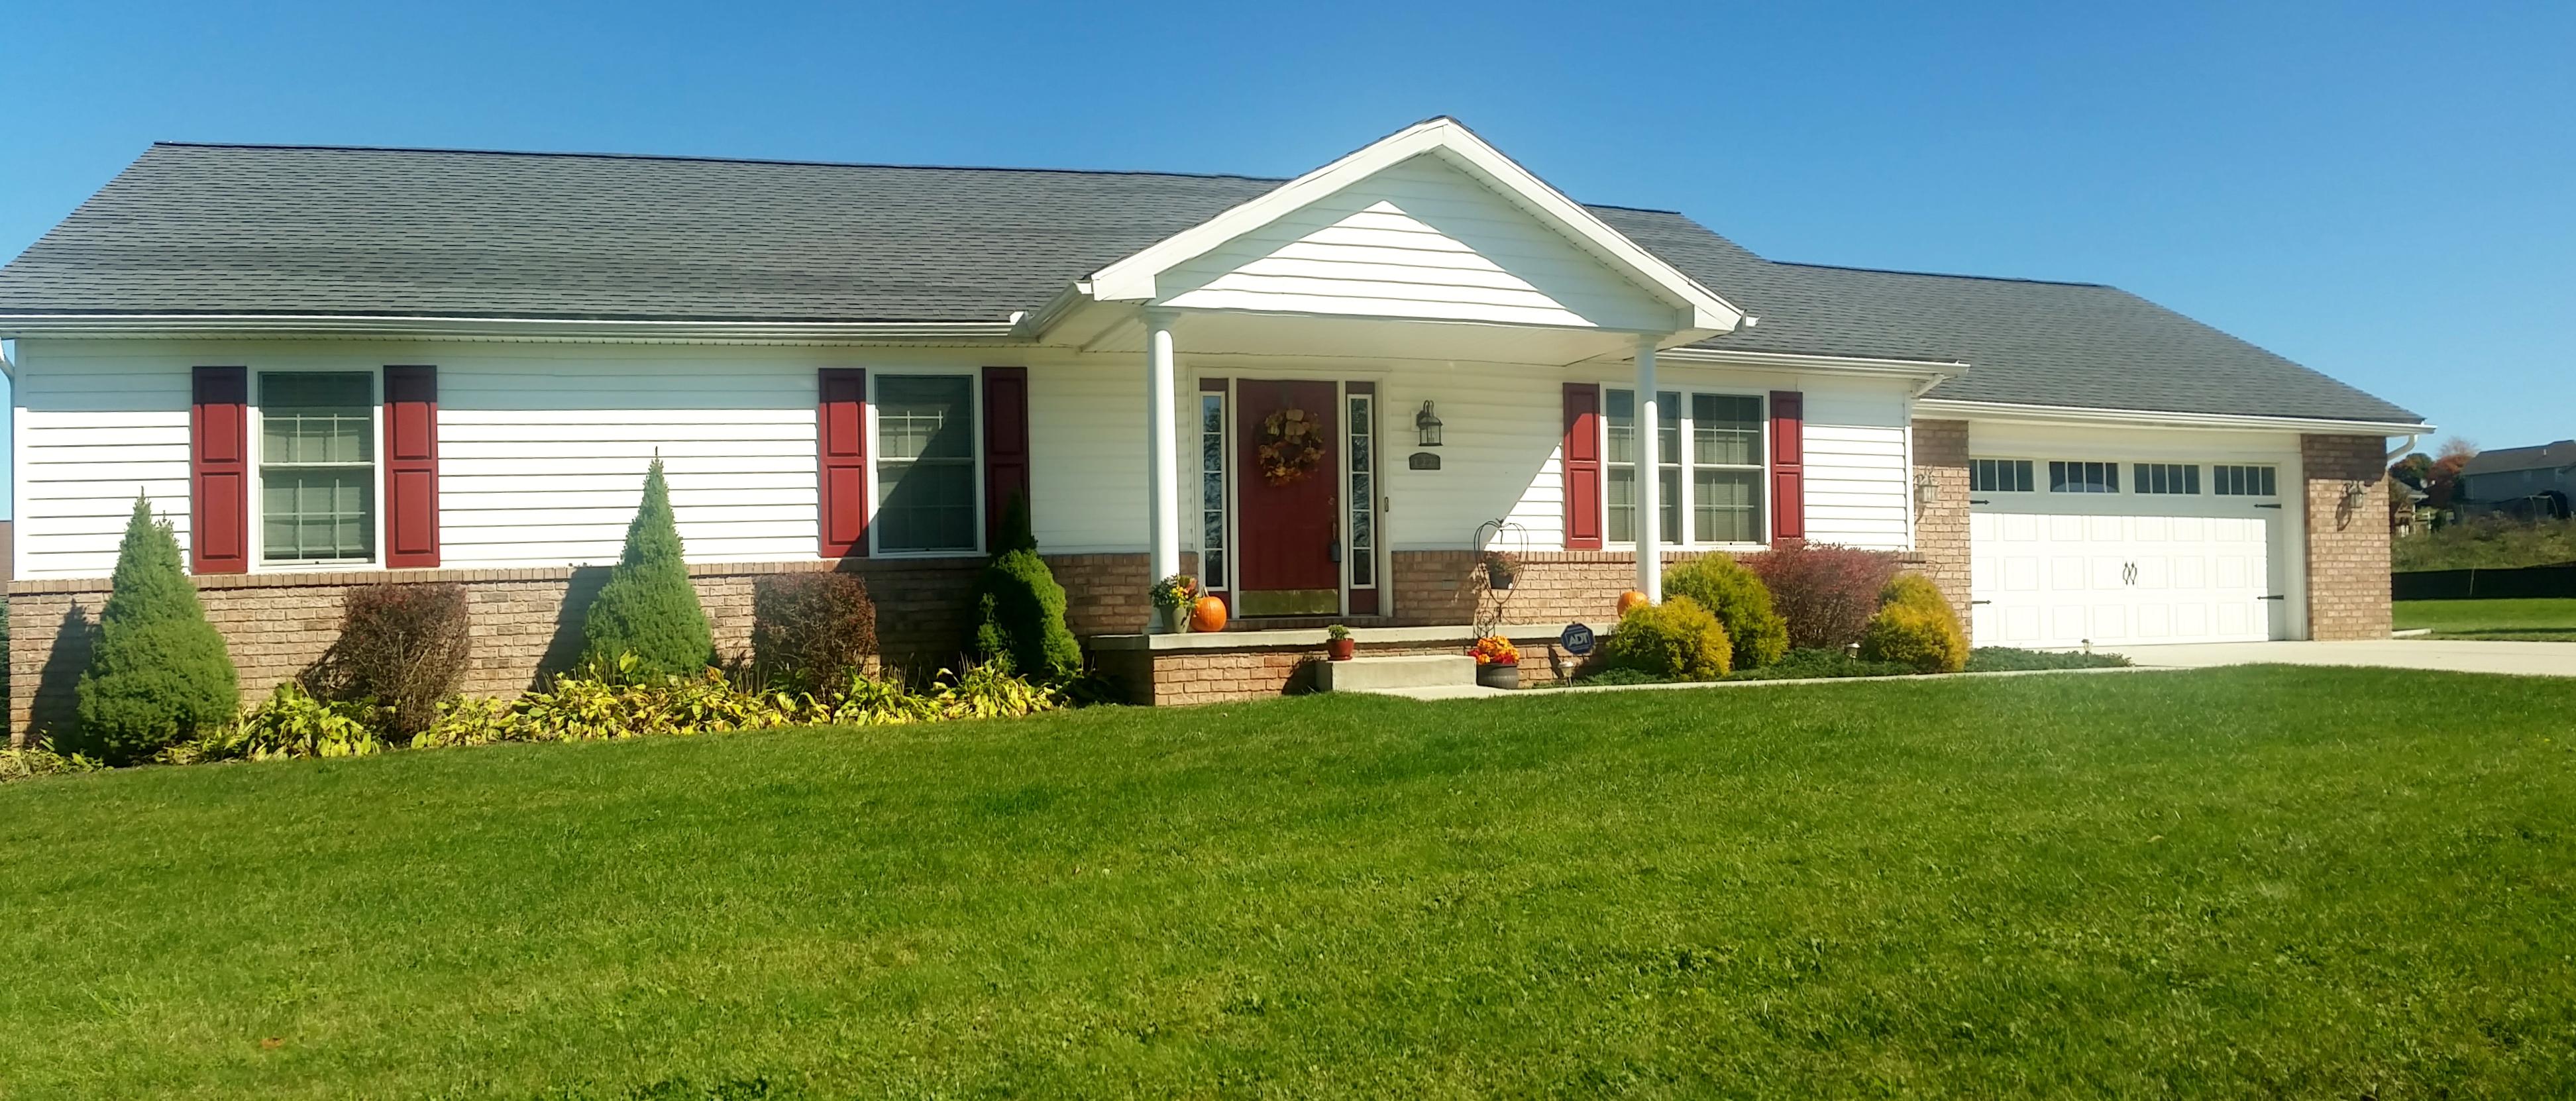 122 Horseshoe Dr. W, Bruceton Mills, West Virginia 26525